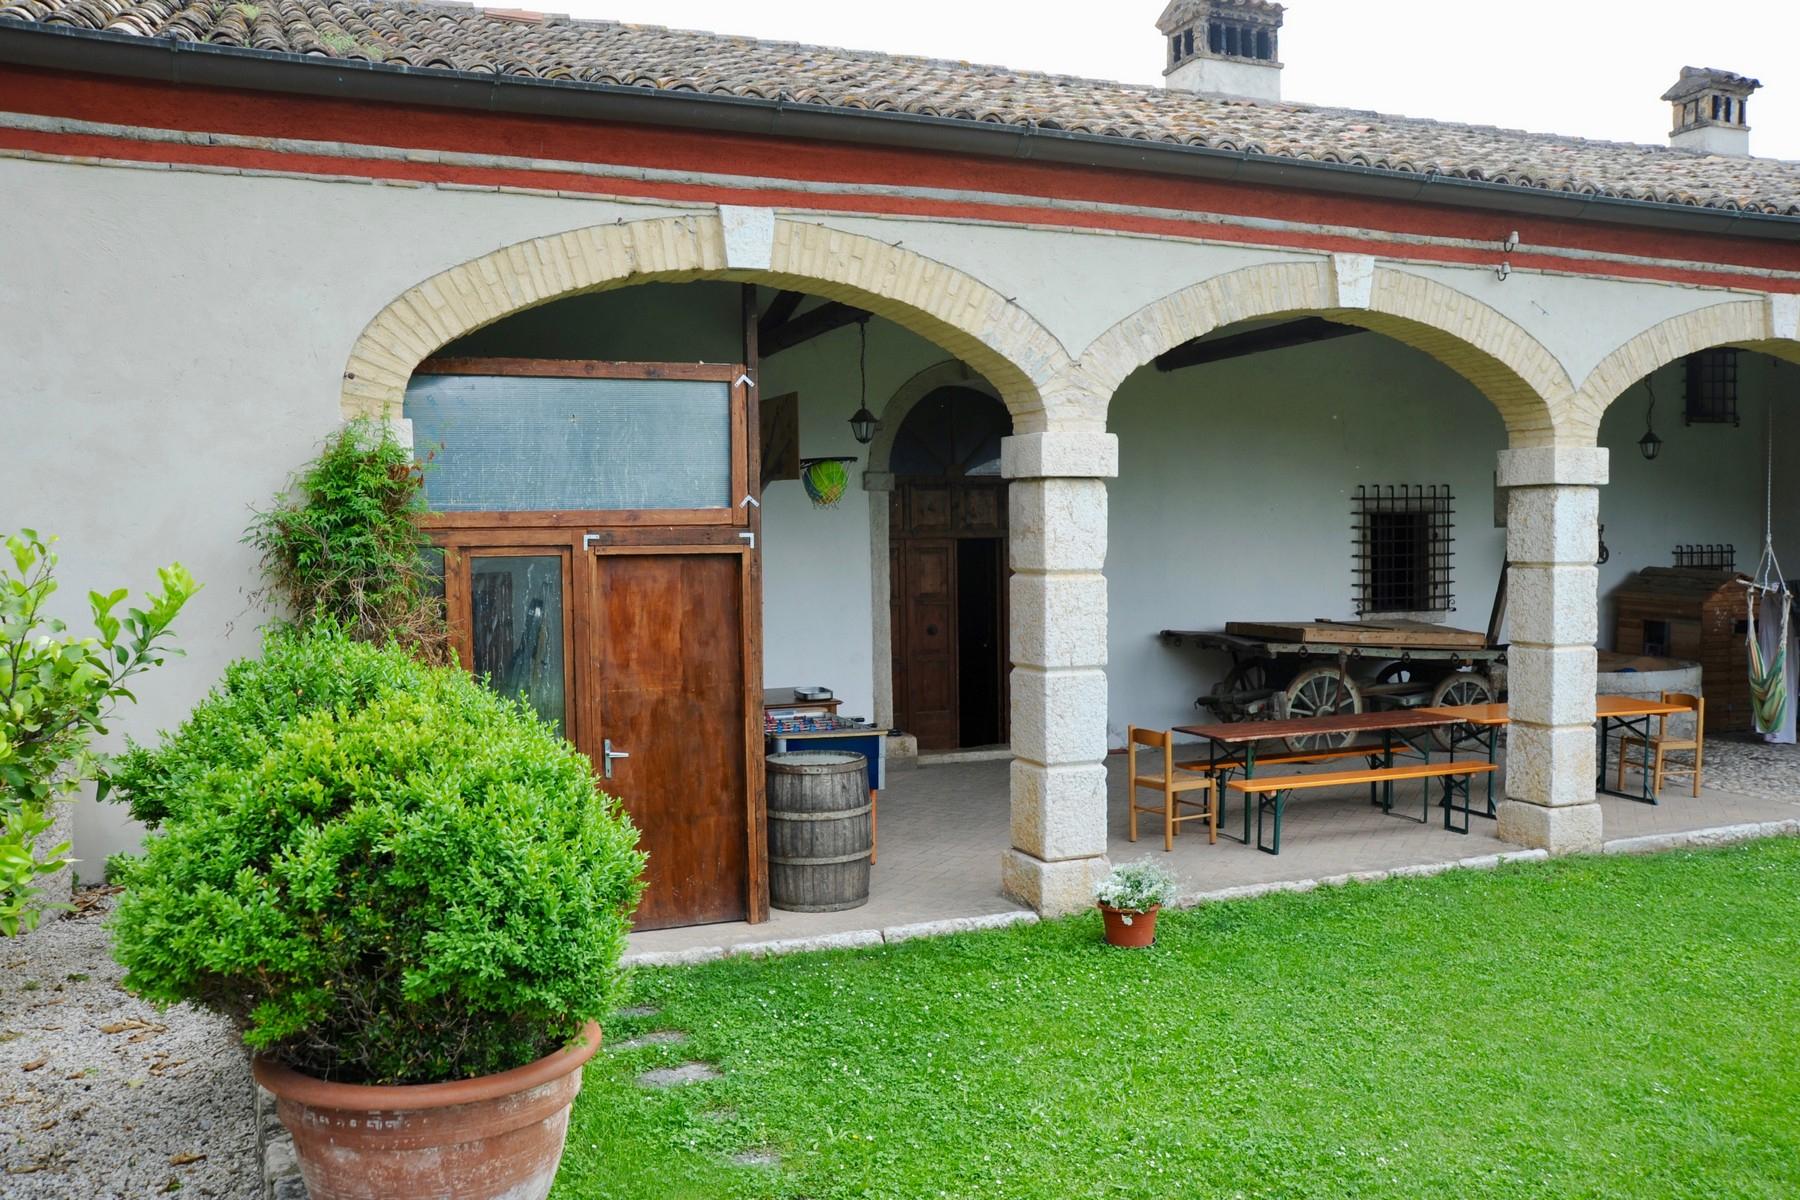 Villa in Vendita a Verona: 5 locali, 450 mq - Foto 22